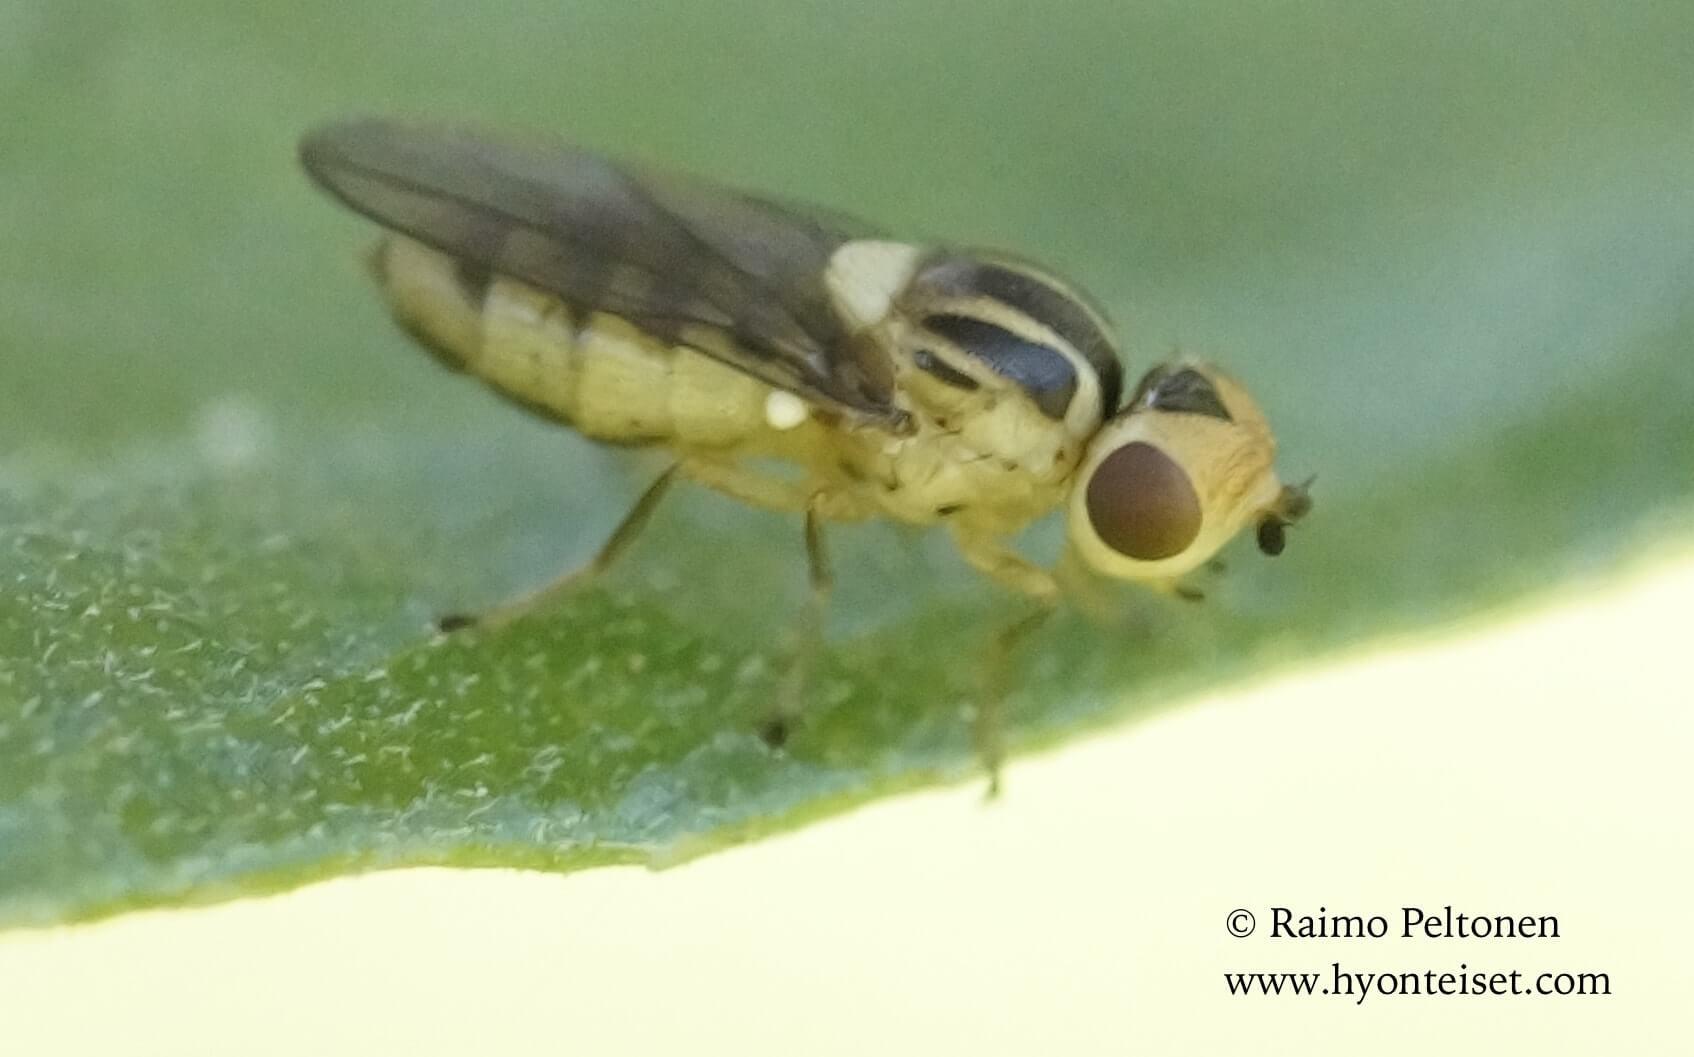 Chlorops/Thaumatomyia sp. (det. Kaj Winqvist)